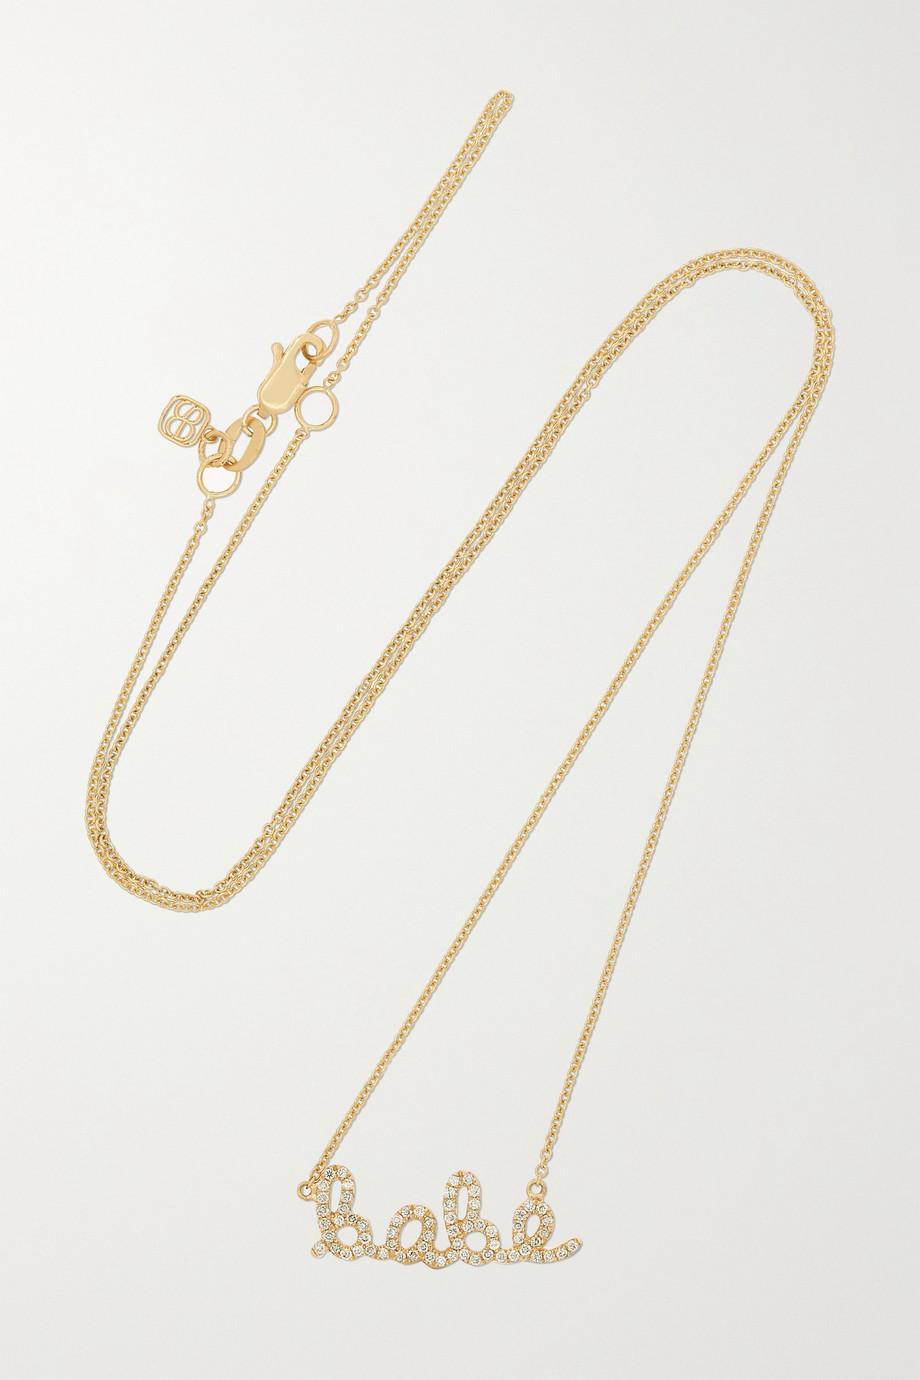 Sydney Evan Babe 14-karat gold diamond necklace